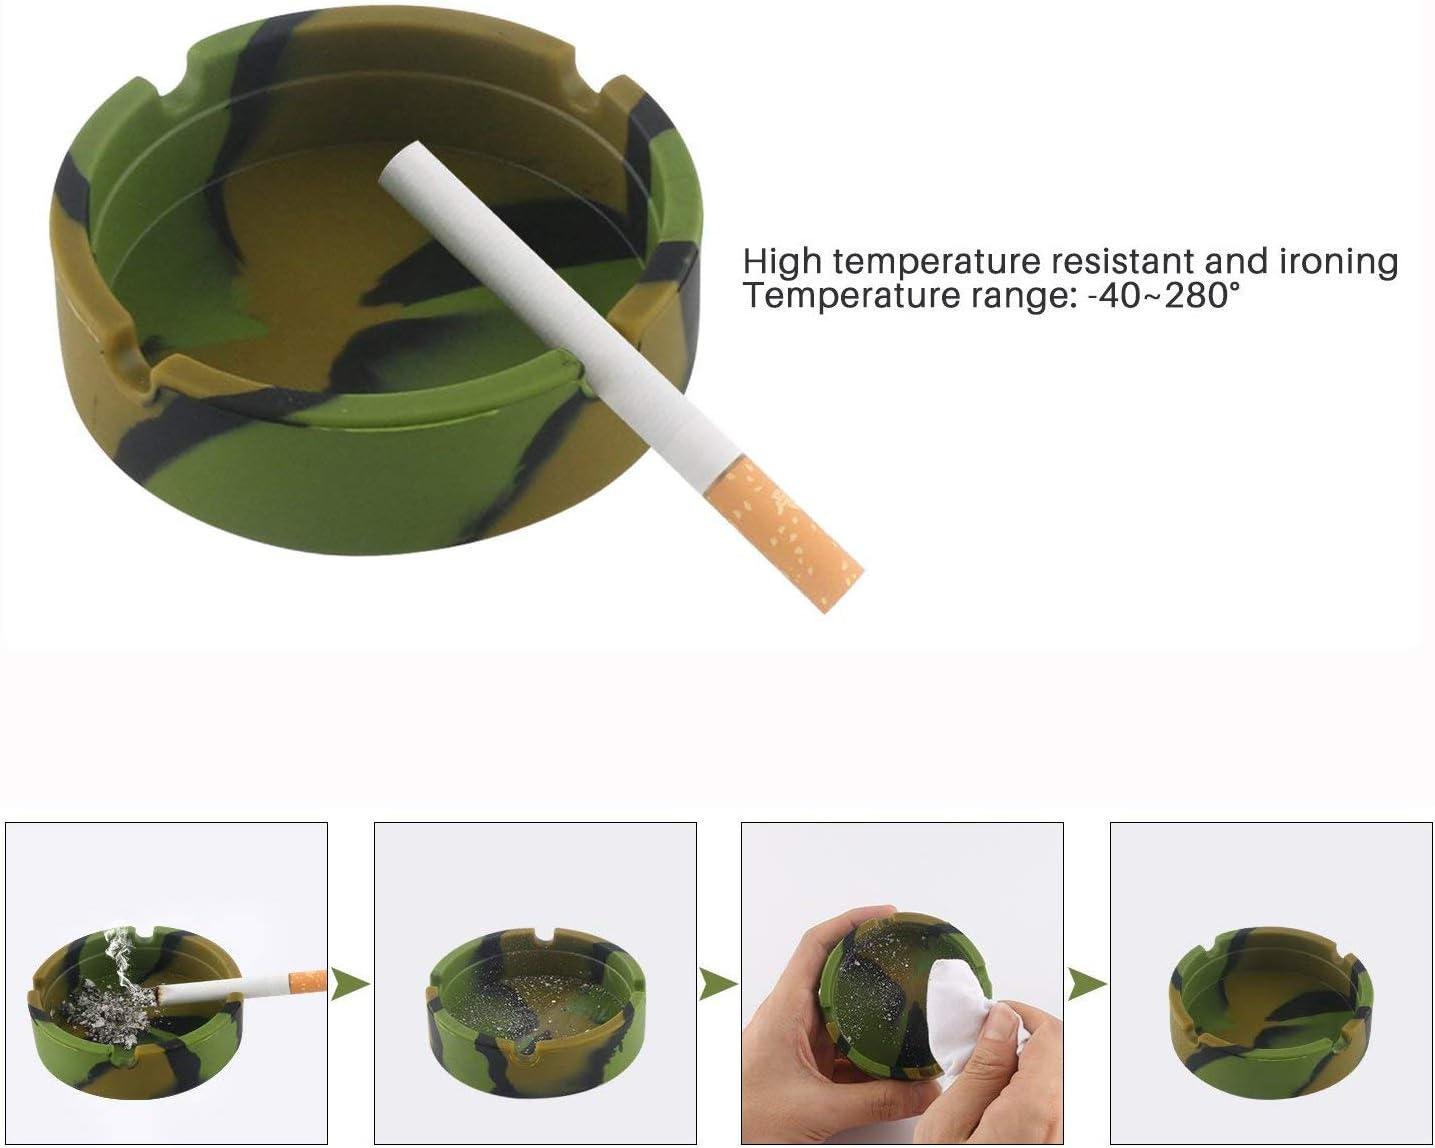 Gizhome 3 Pack Silicone Ashtray Premium Silicone Rubber High Temperature Heat Resistant Round Design Ashtray Durable Camouflage Colors